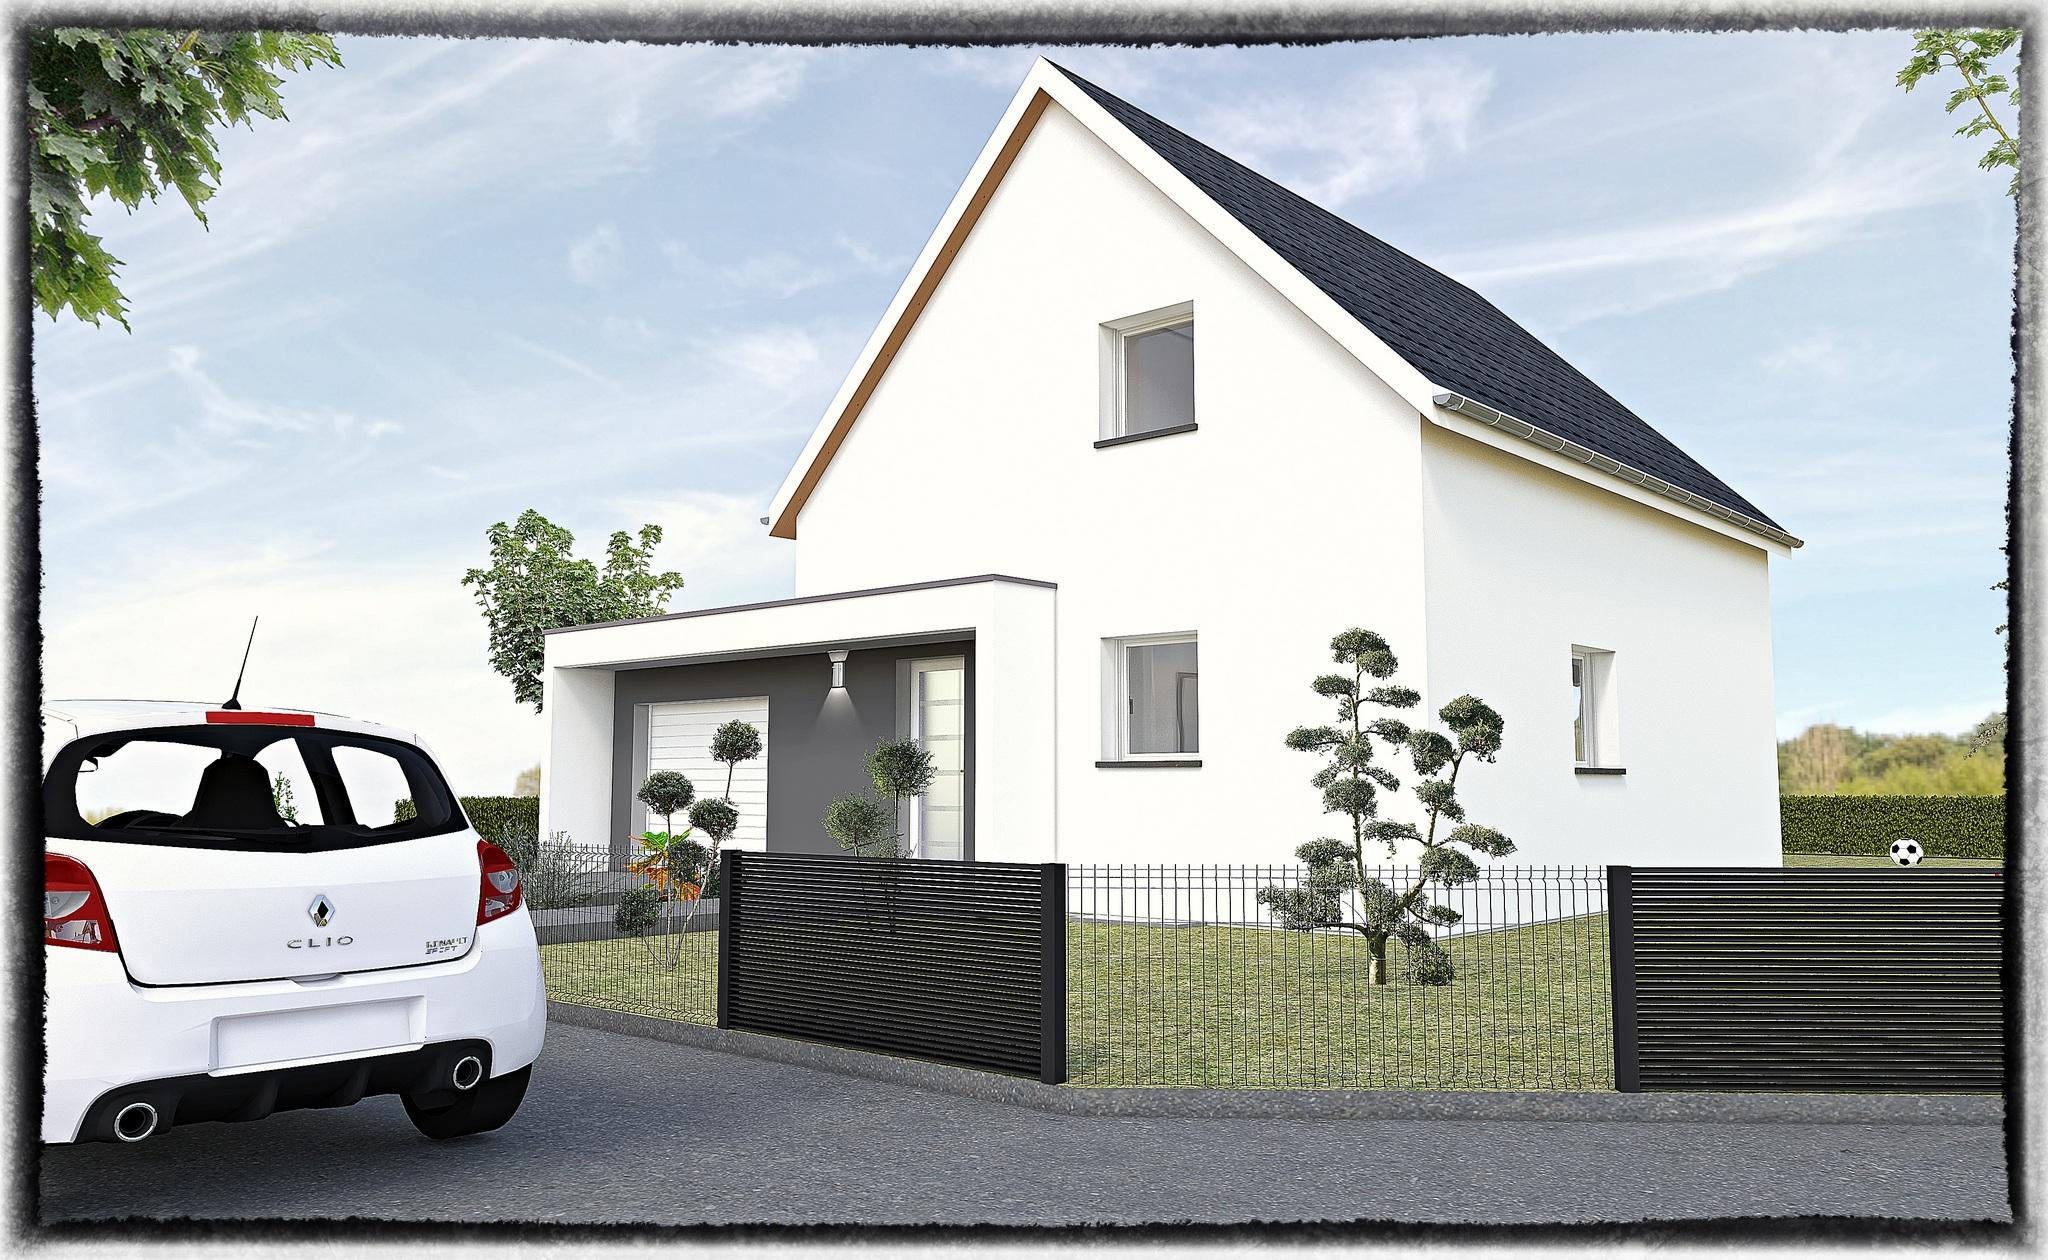 Maisons + Terrains du constructeur MAISONS CRISALIS • 90 m² • OTTMARSHEIM